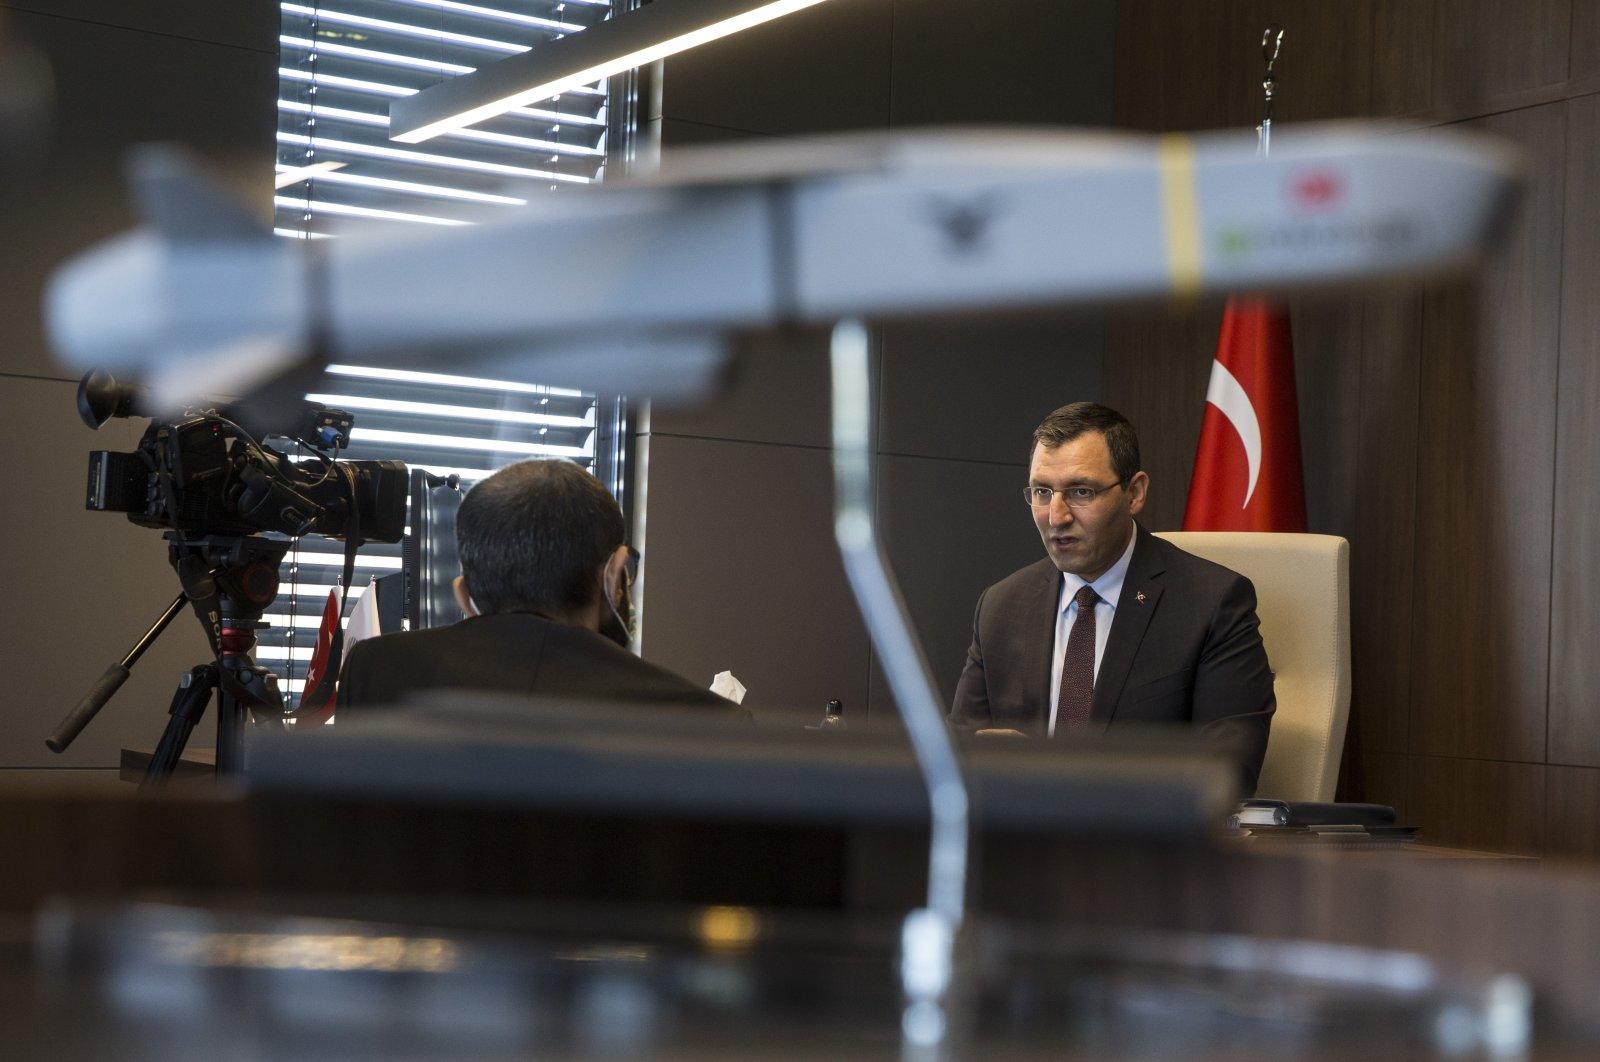 Roketsan Chairperson Murat İkinci gives an interview to an Anadolu Agency reporter regarding Turkey's space program, the capital Ankara, Sept. 13, 2020. (AA Photo)